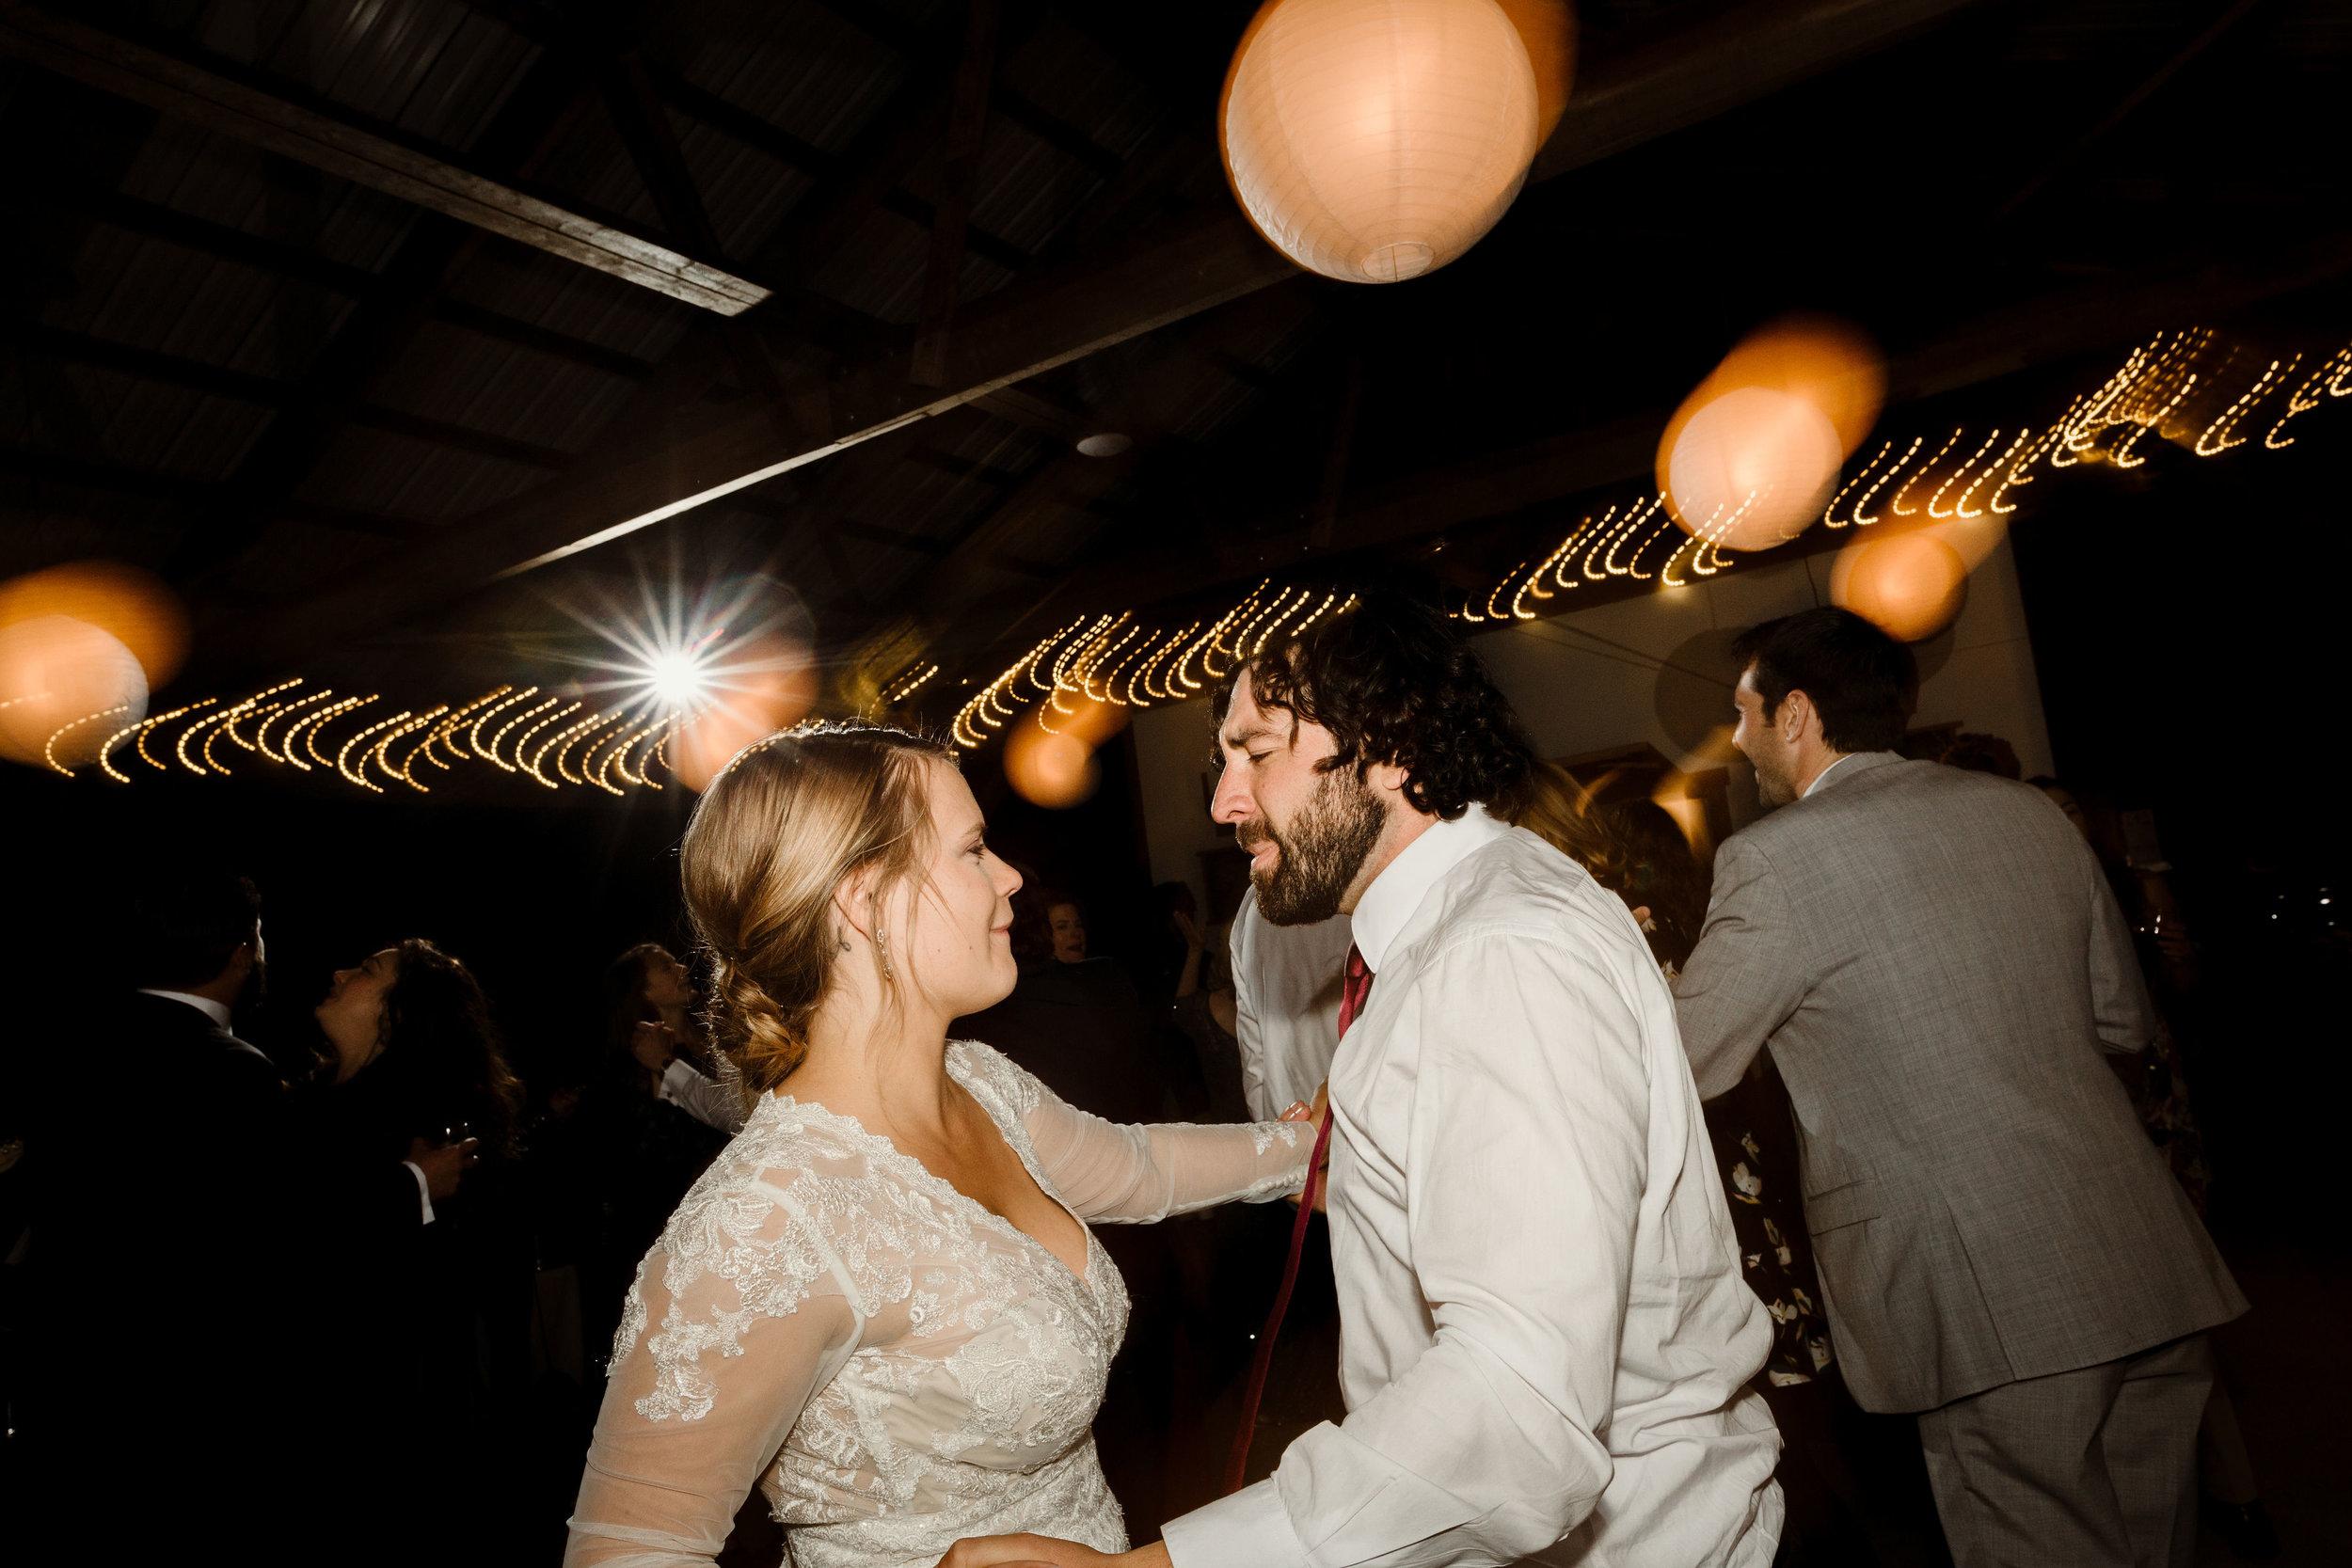 young-love-media-rustic-fall-autumn-wedding-emmerich-tree-farm-hudson-valley-warwick-new-york-reception-388.jpg